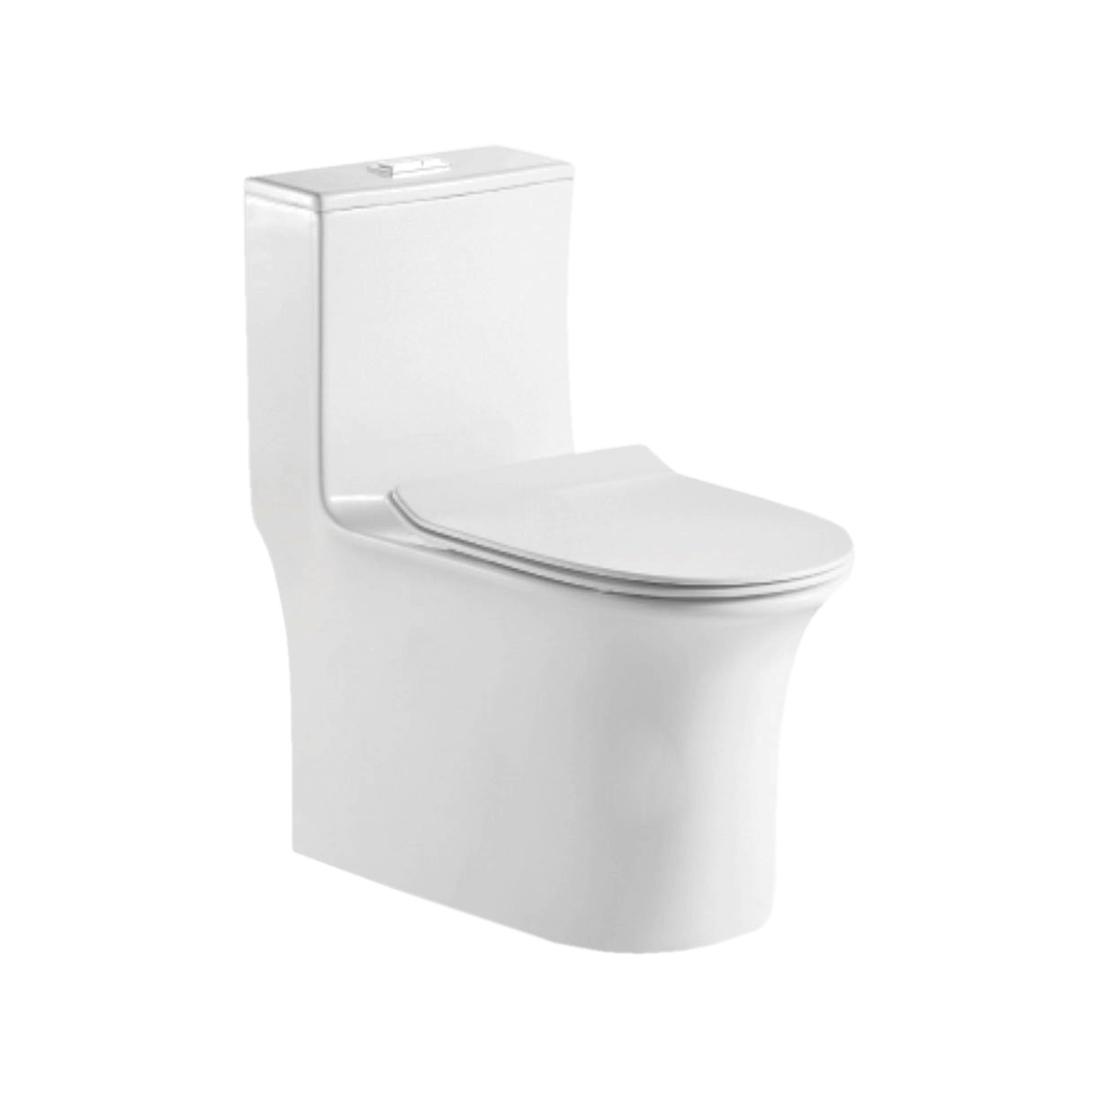 Kerovit Vita KB3027 Siphonic Single Piece European Water Closet With Seat Cover